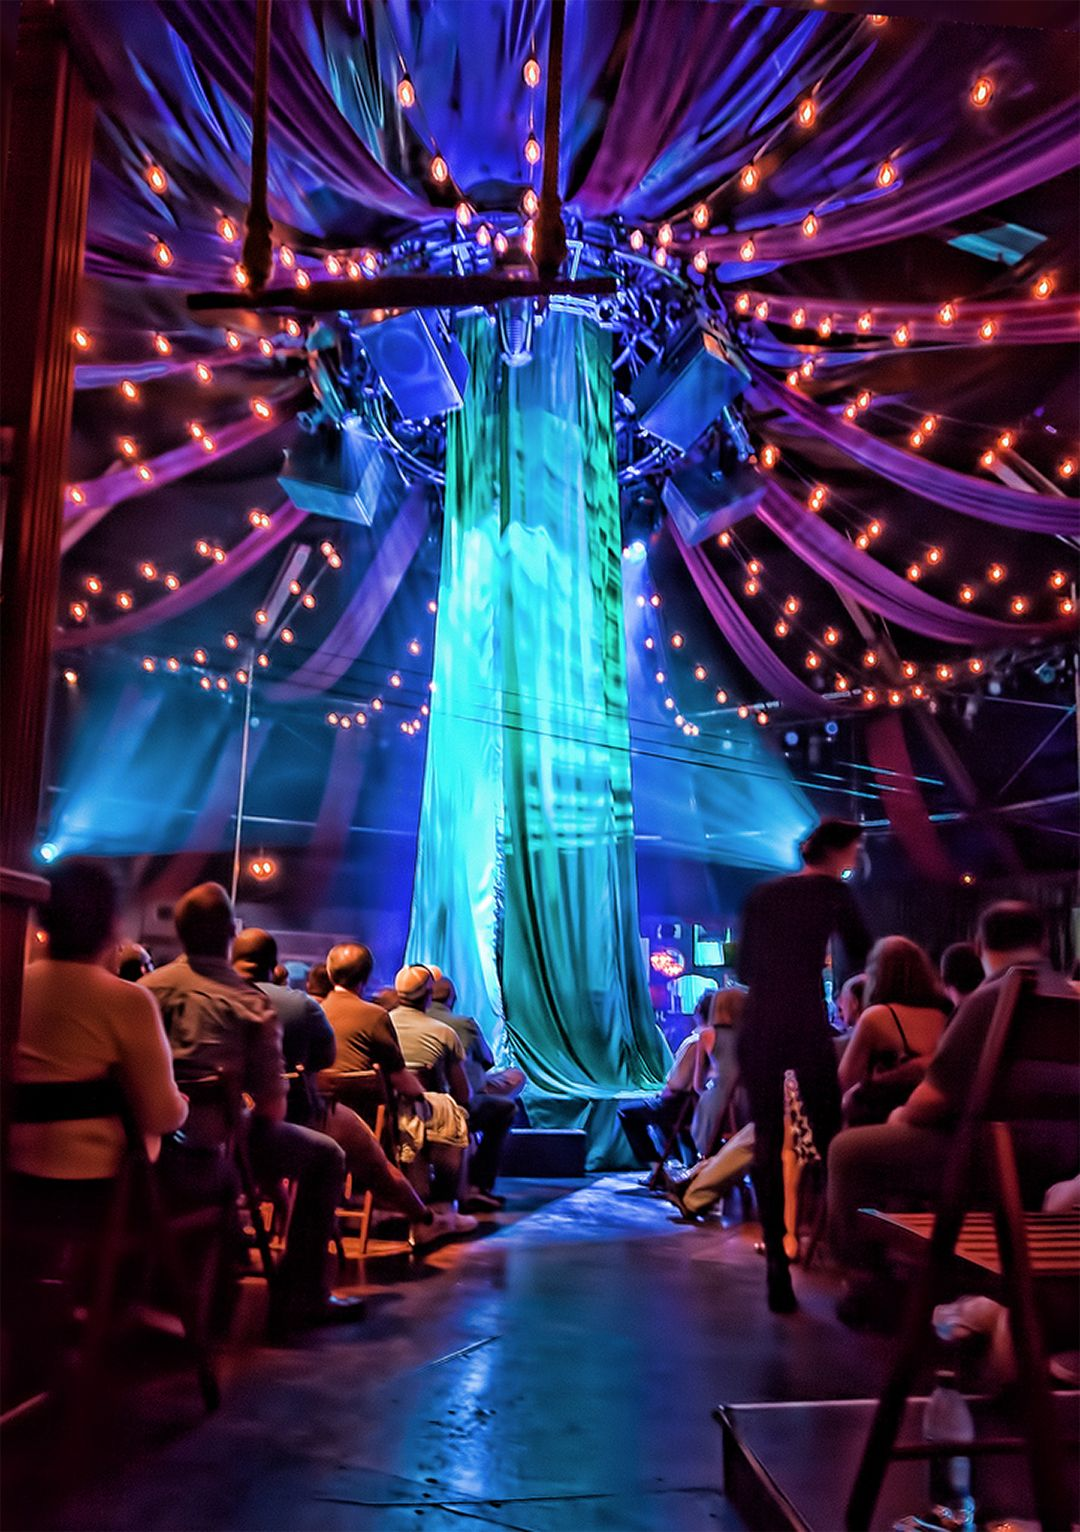 Absinthe Of Las Vegas An Absolutely Amazing Show We Saw On Our Honeymoon Las Vegas Vacation Vegas Vacation Vegas Trip